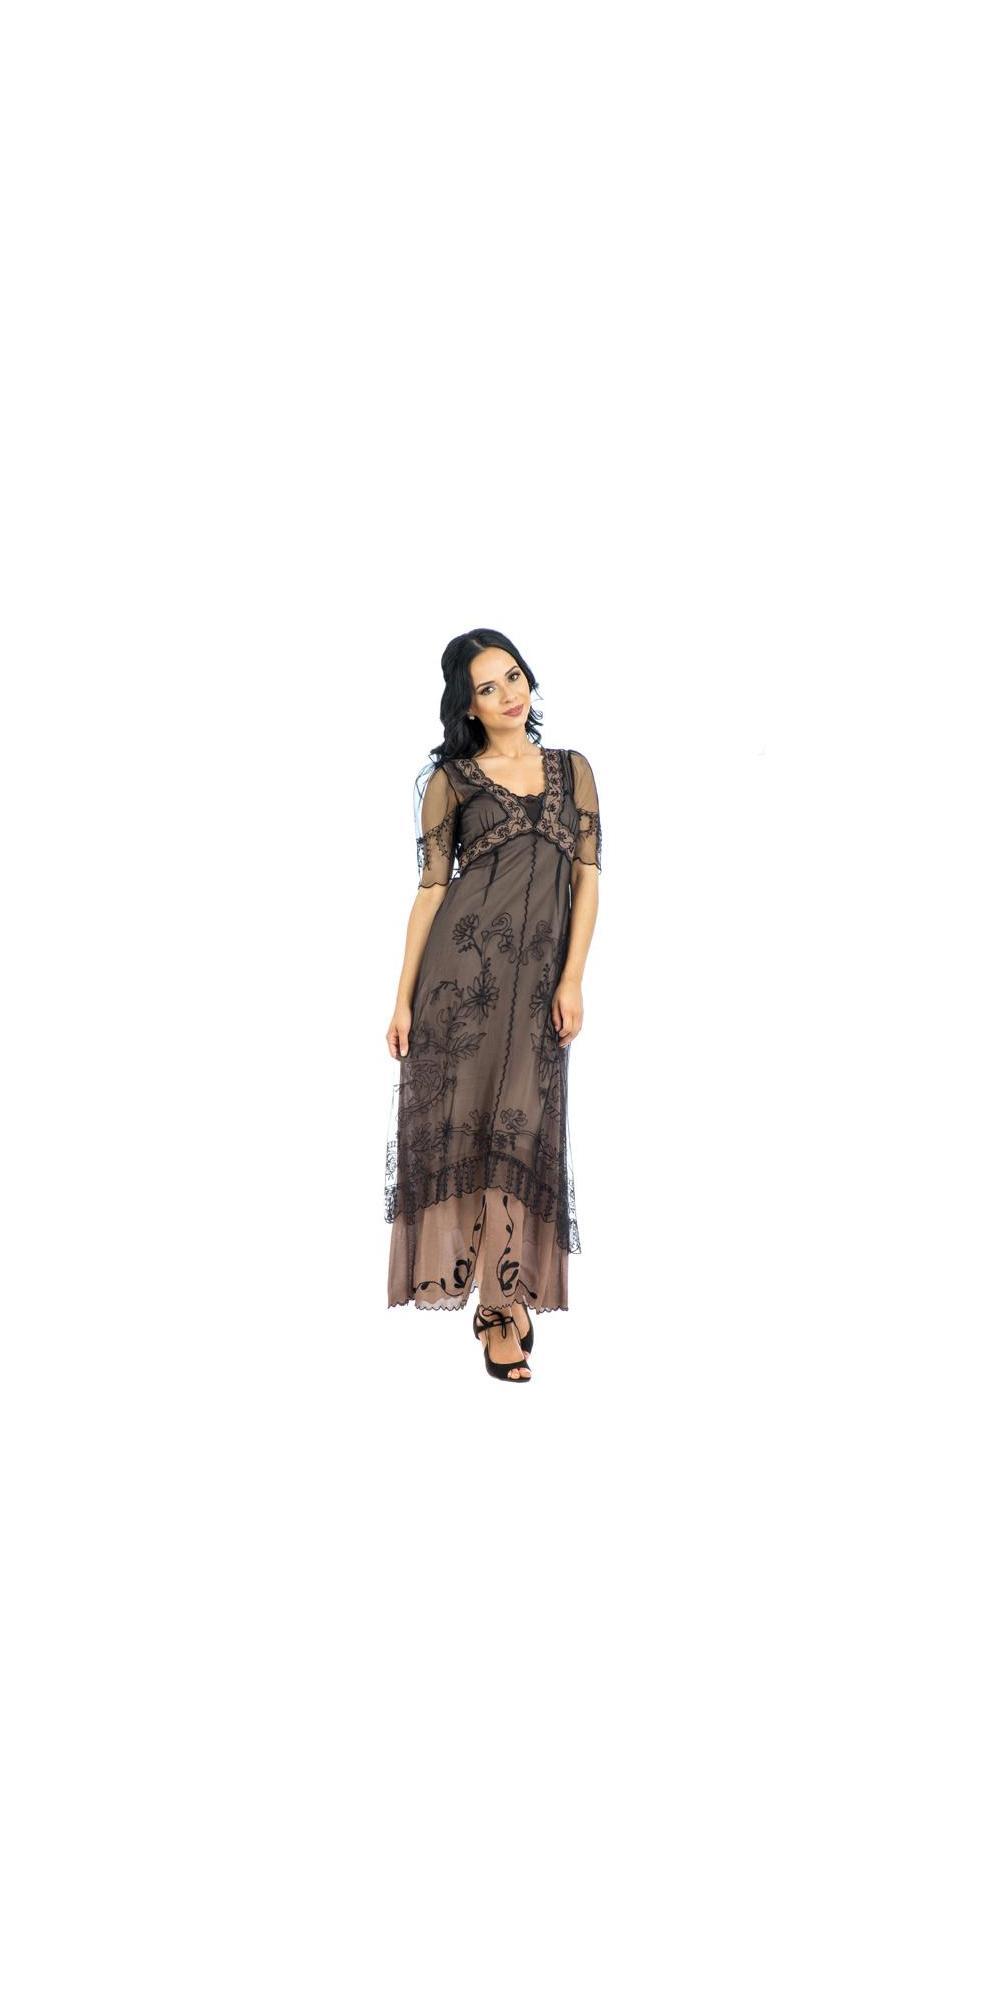 Nataya 40007 New Titanic Dress in Black/Coco